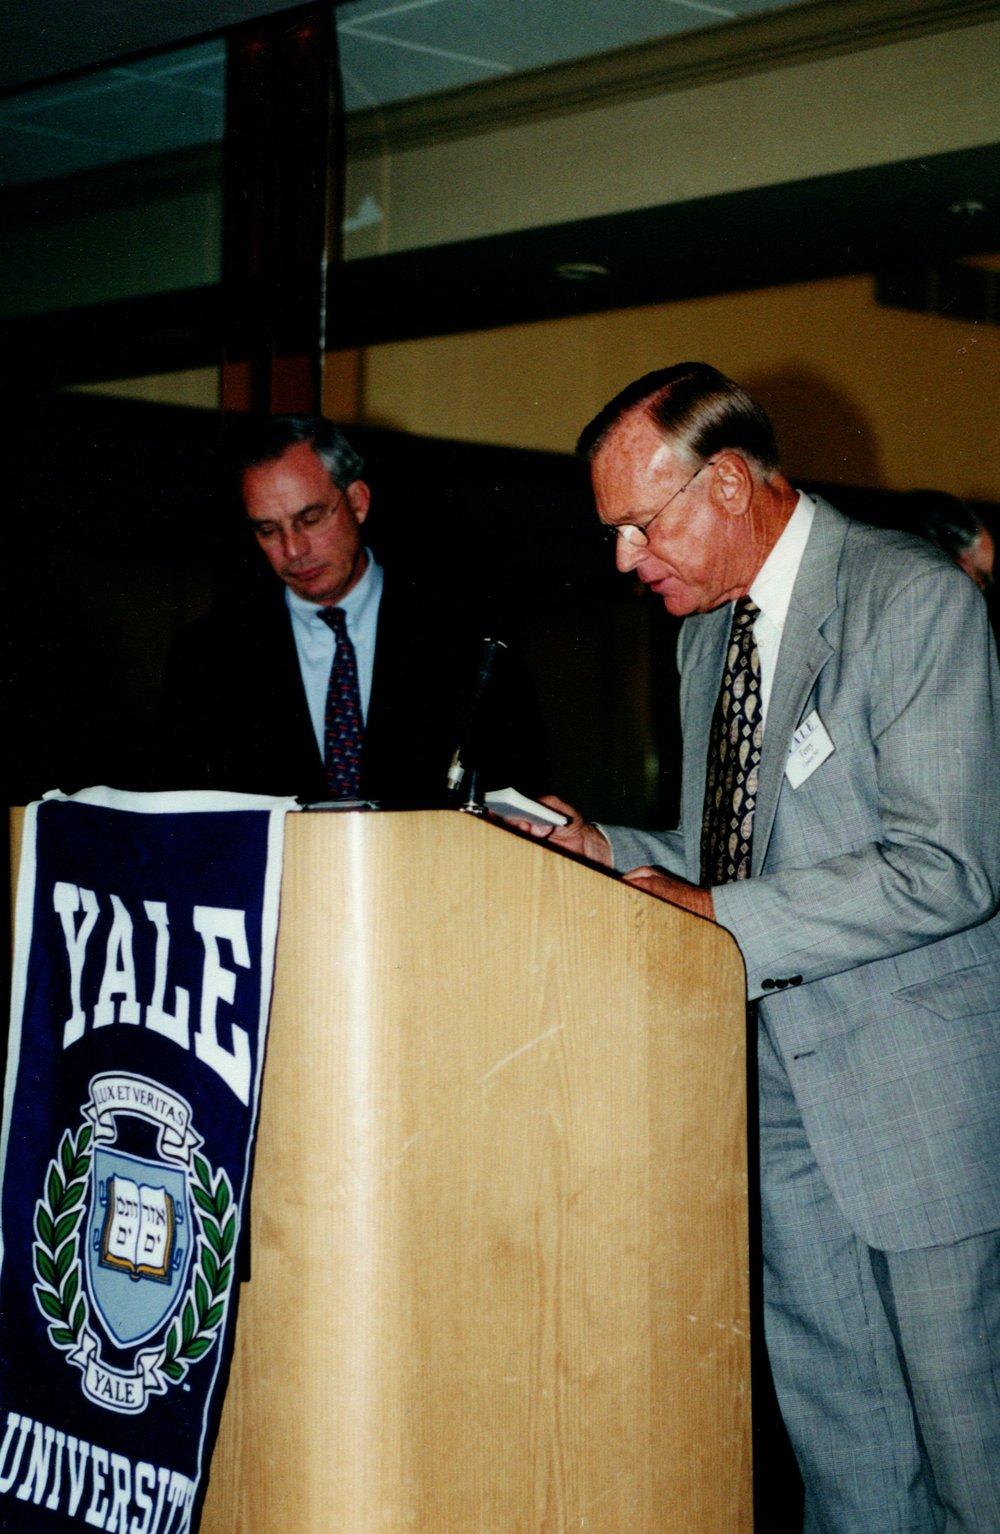 4_2_2001 -4TH TERCENTENNIAL SPEAKER TRIBUTE PROGRAM HOSTED BY NORTHERN TRUST 13.jpg